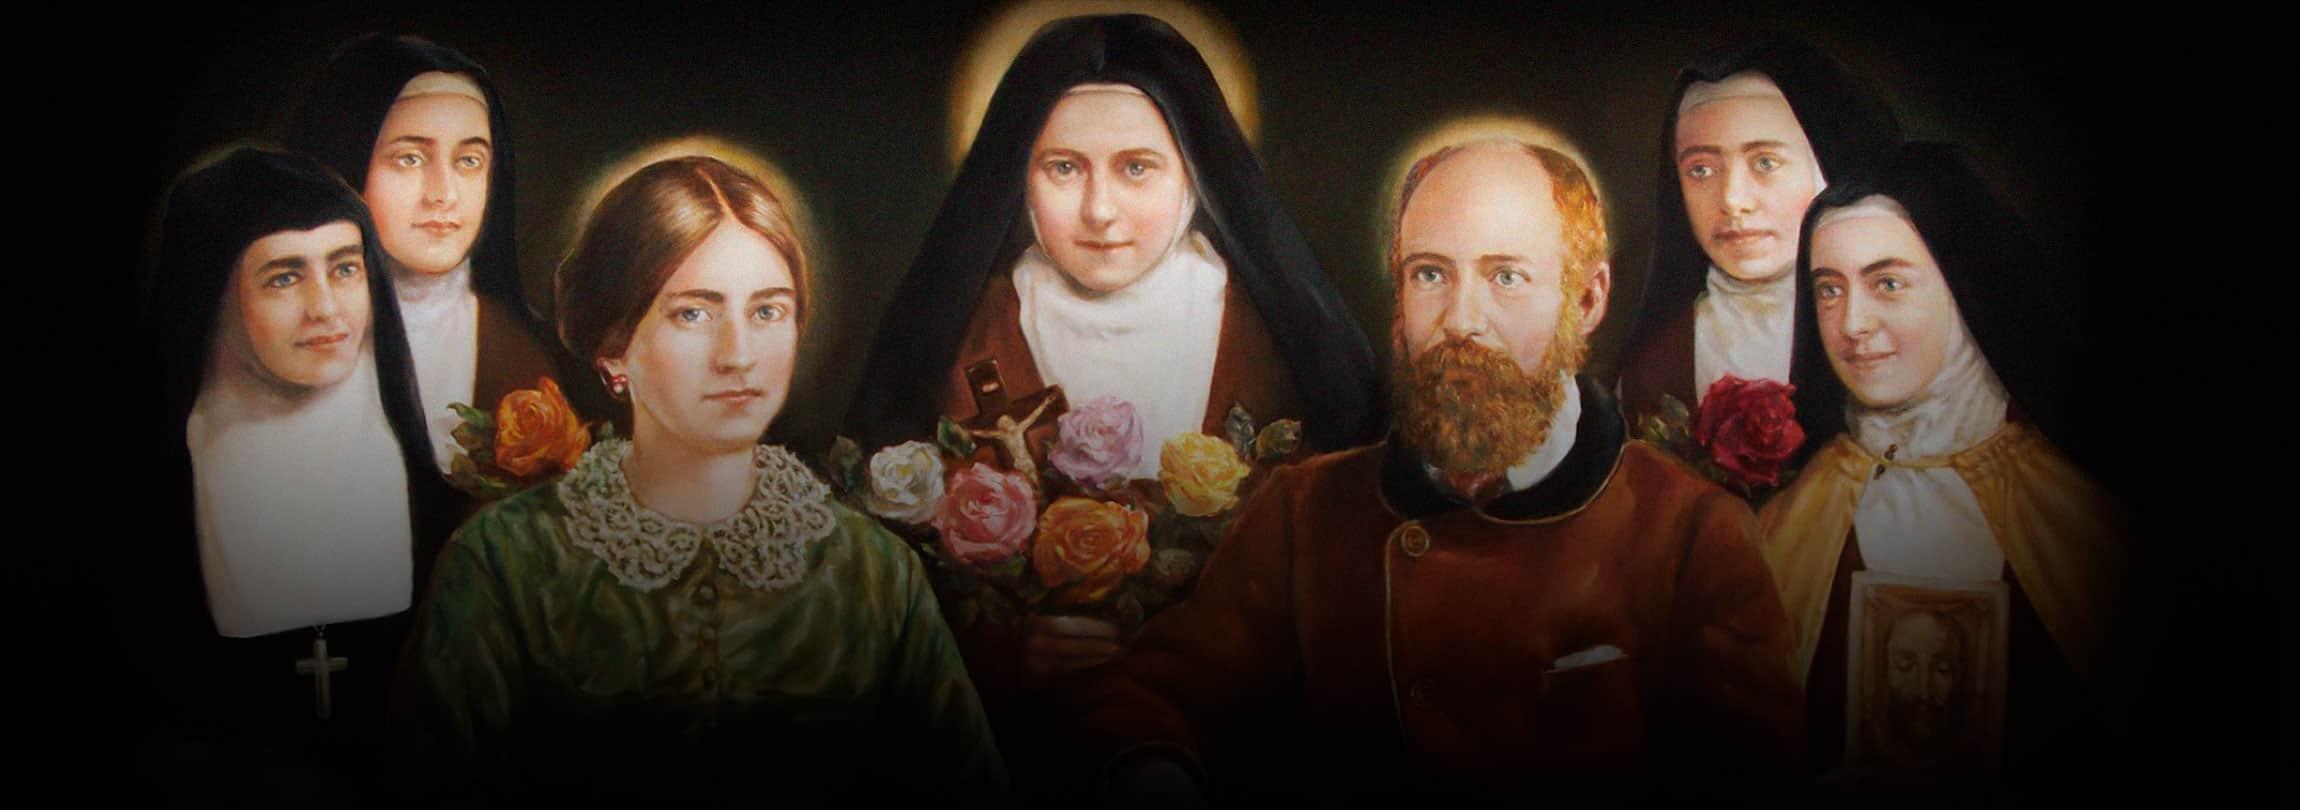 Pais santos geram famílias santas